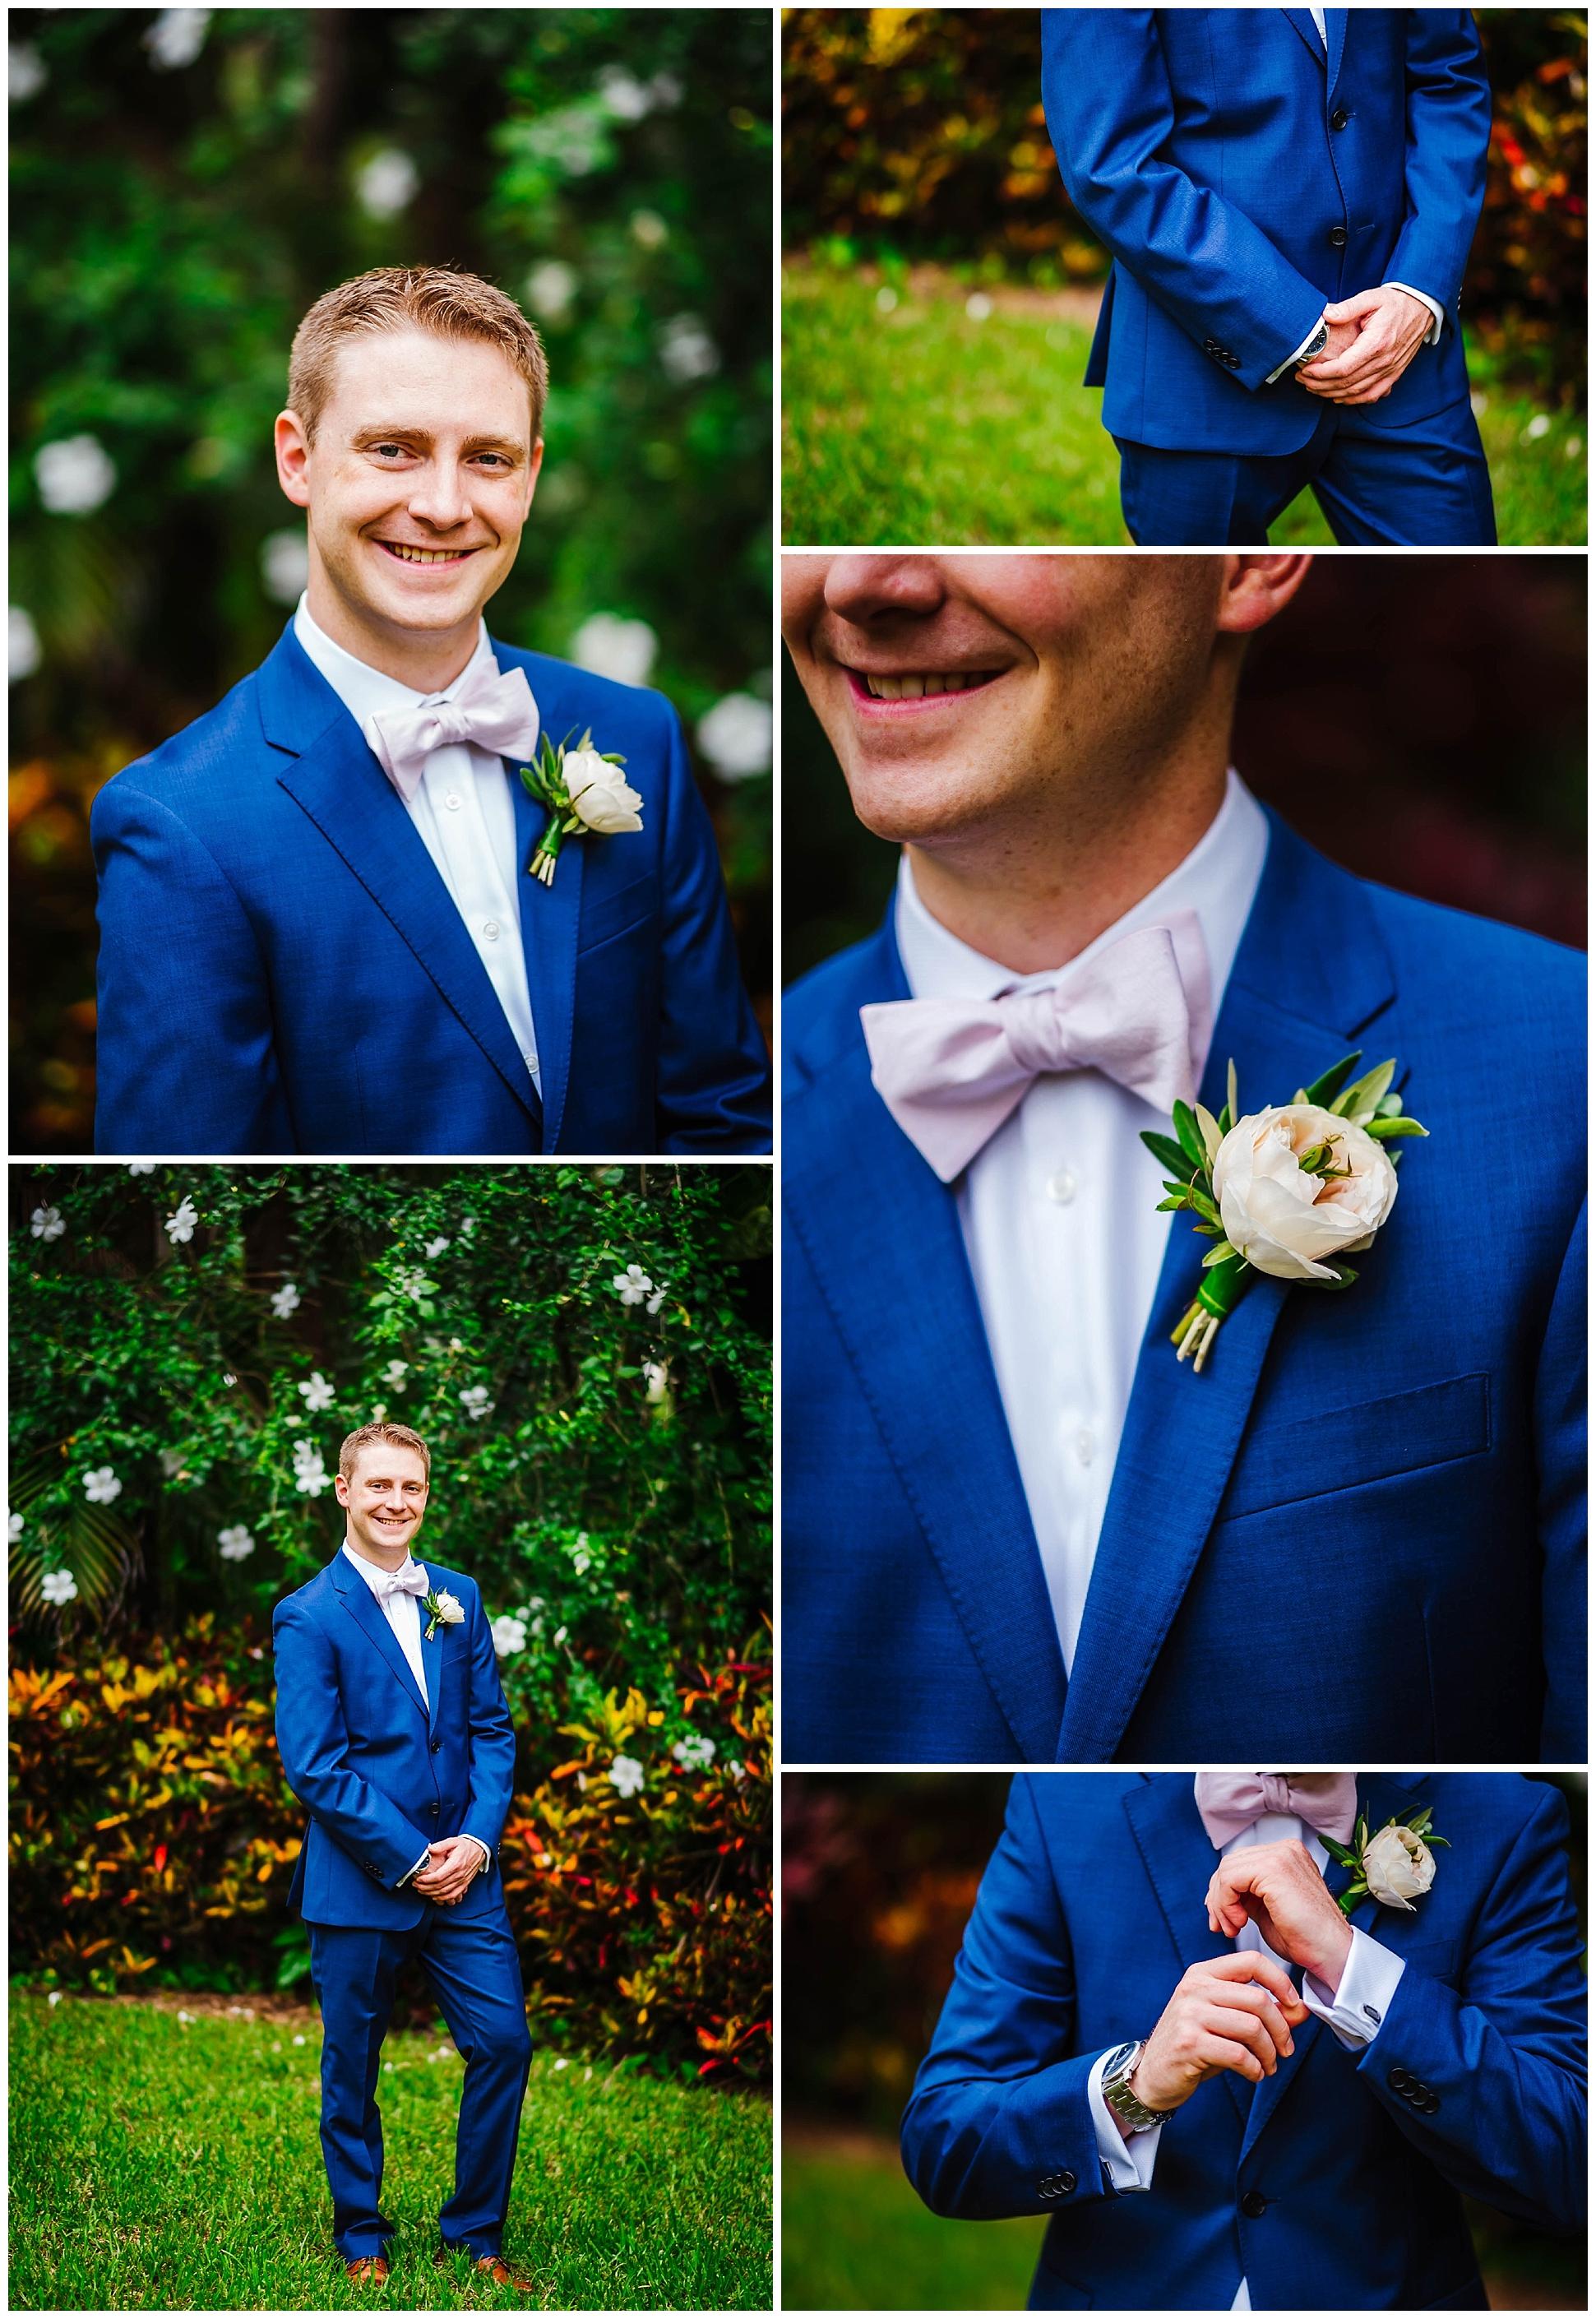 st-pete-wedding-photographer-sunken-gardens-crystal-ballroom-princess-dancer_0137.jpg